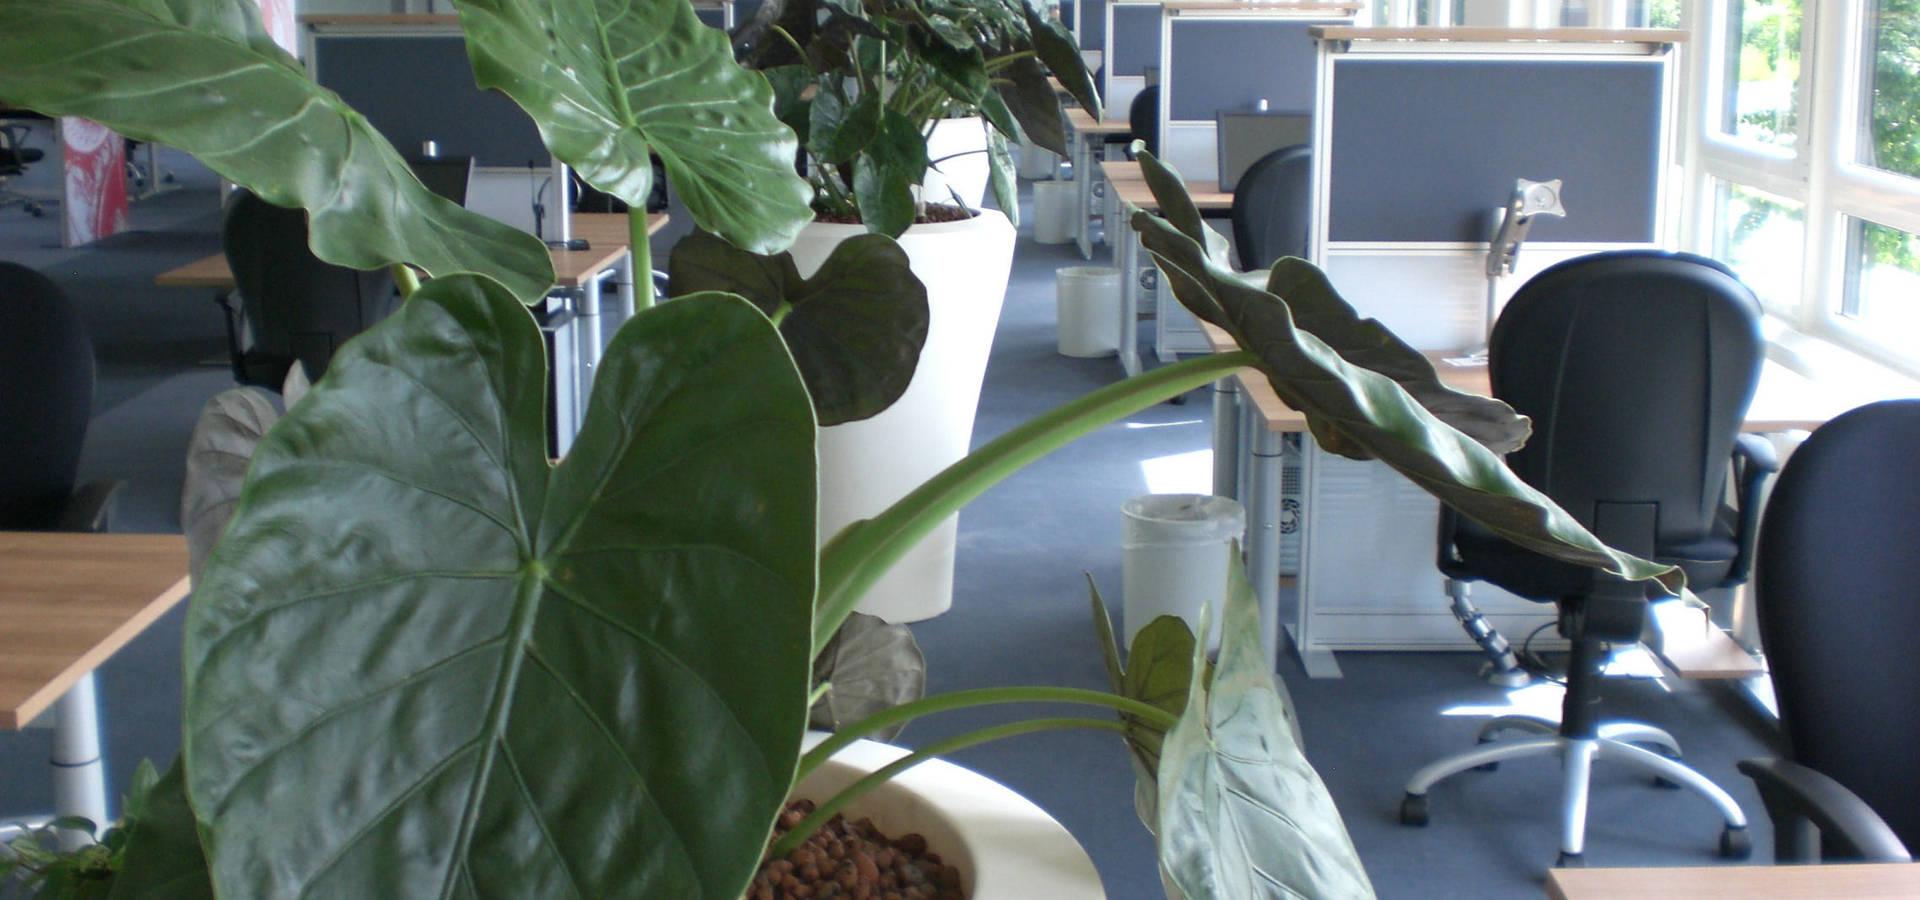 BAUMHAUS GmbH Raumbegrünung Pflanzenpflege